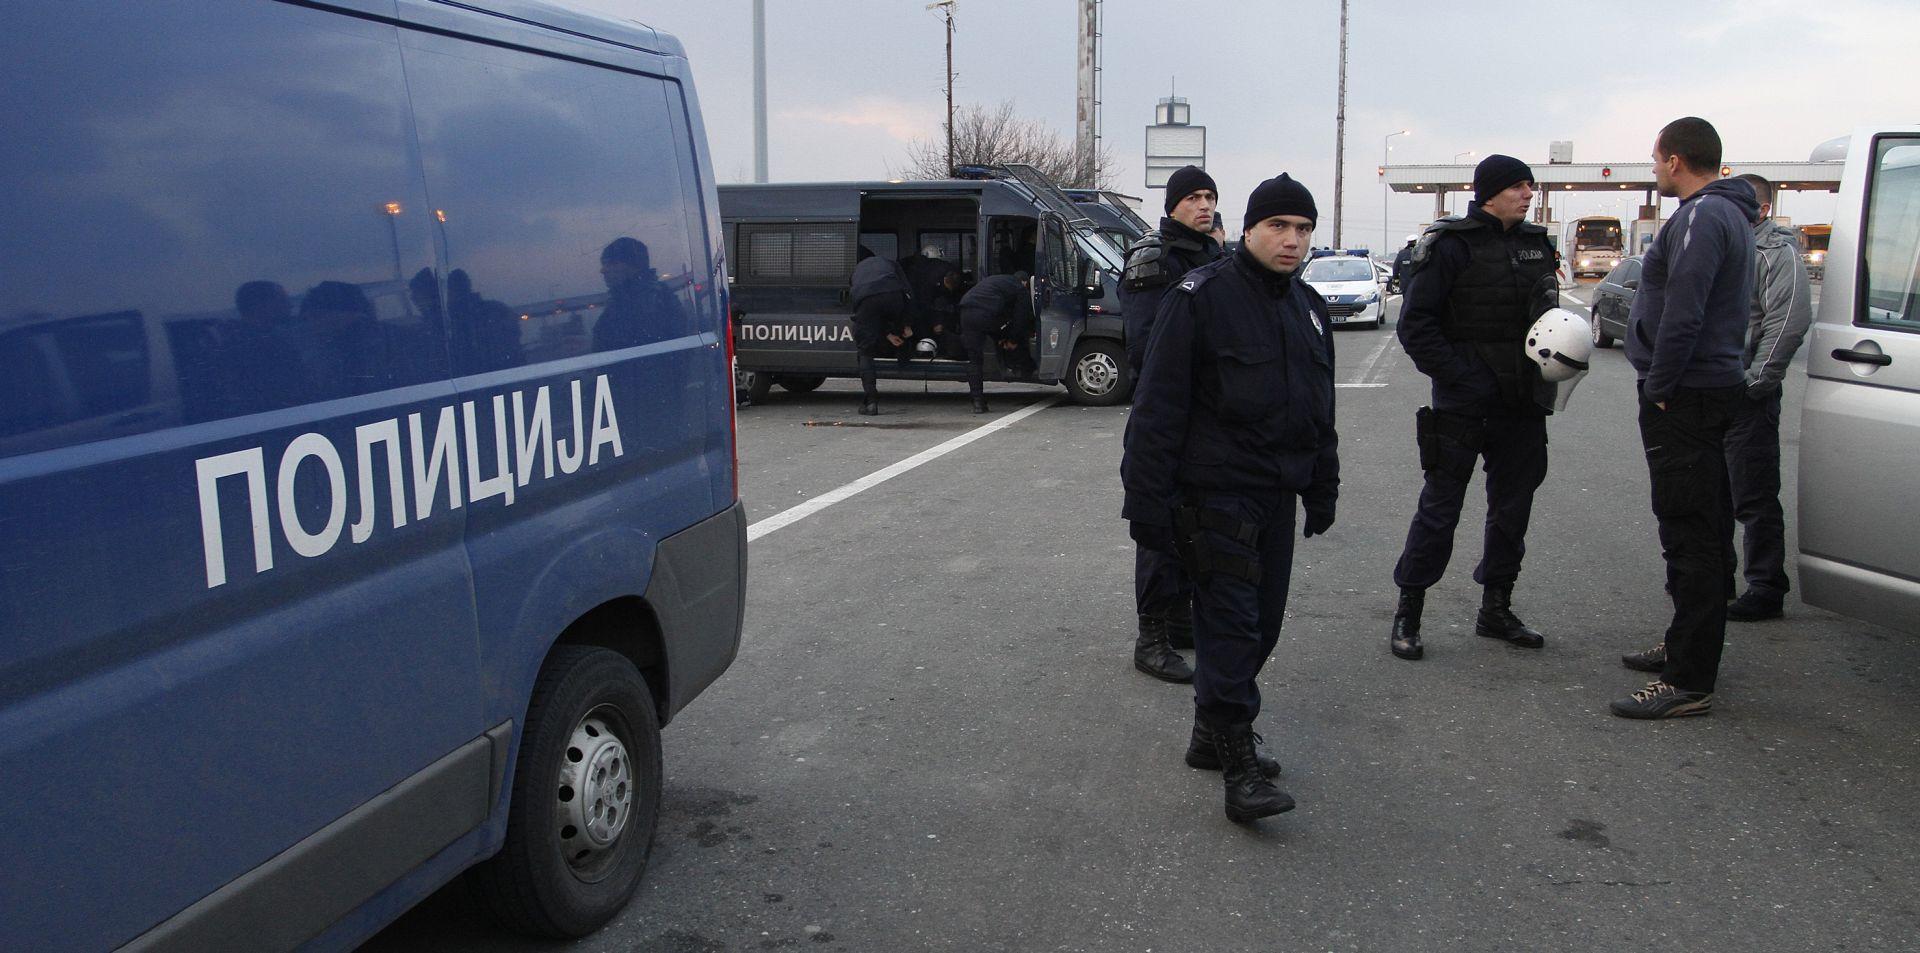 Drama u Beogradu: Naoružan muškarac pucao po gradu, pa uletio u neboder